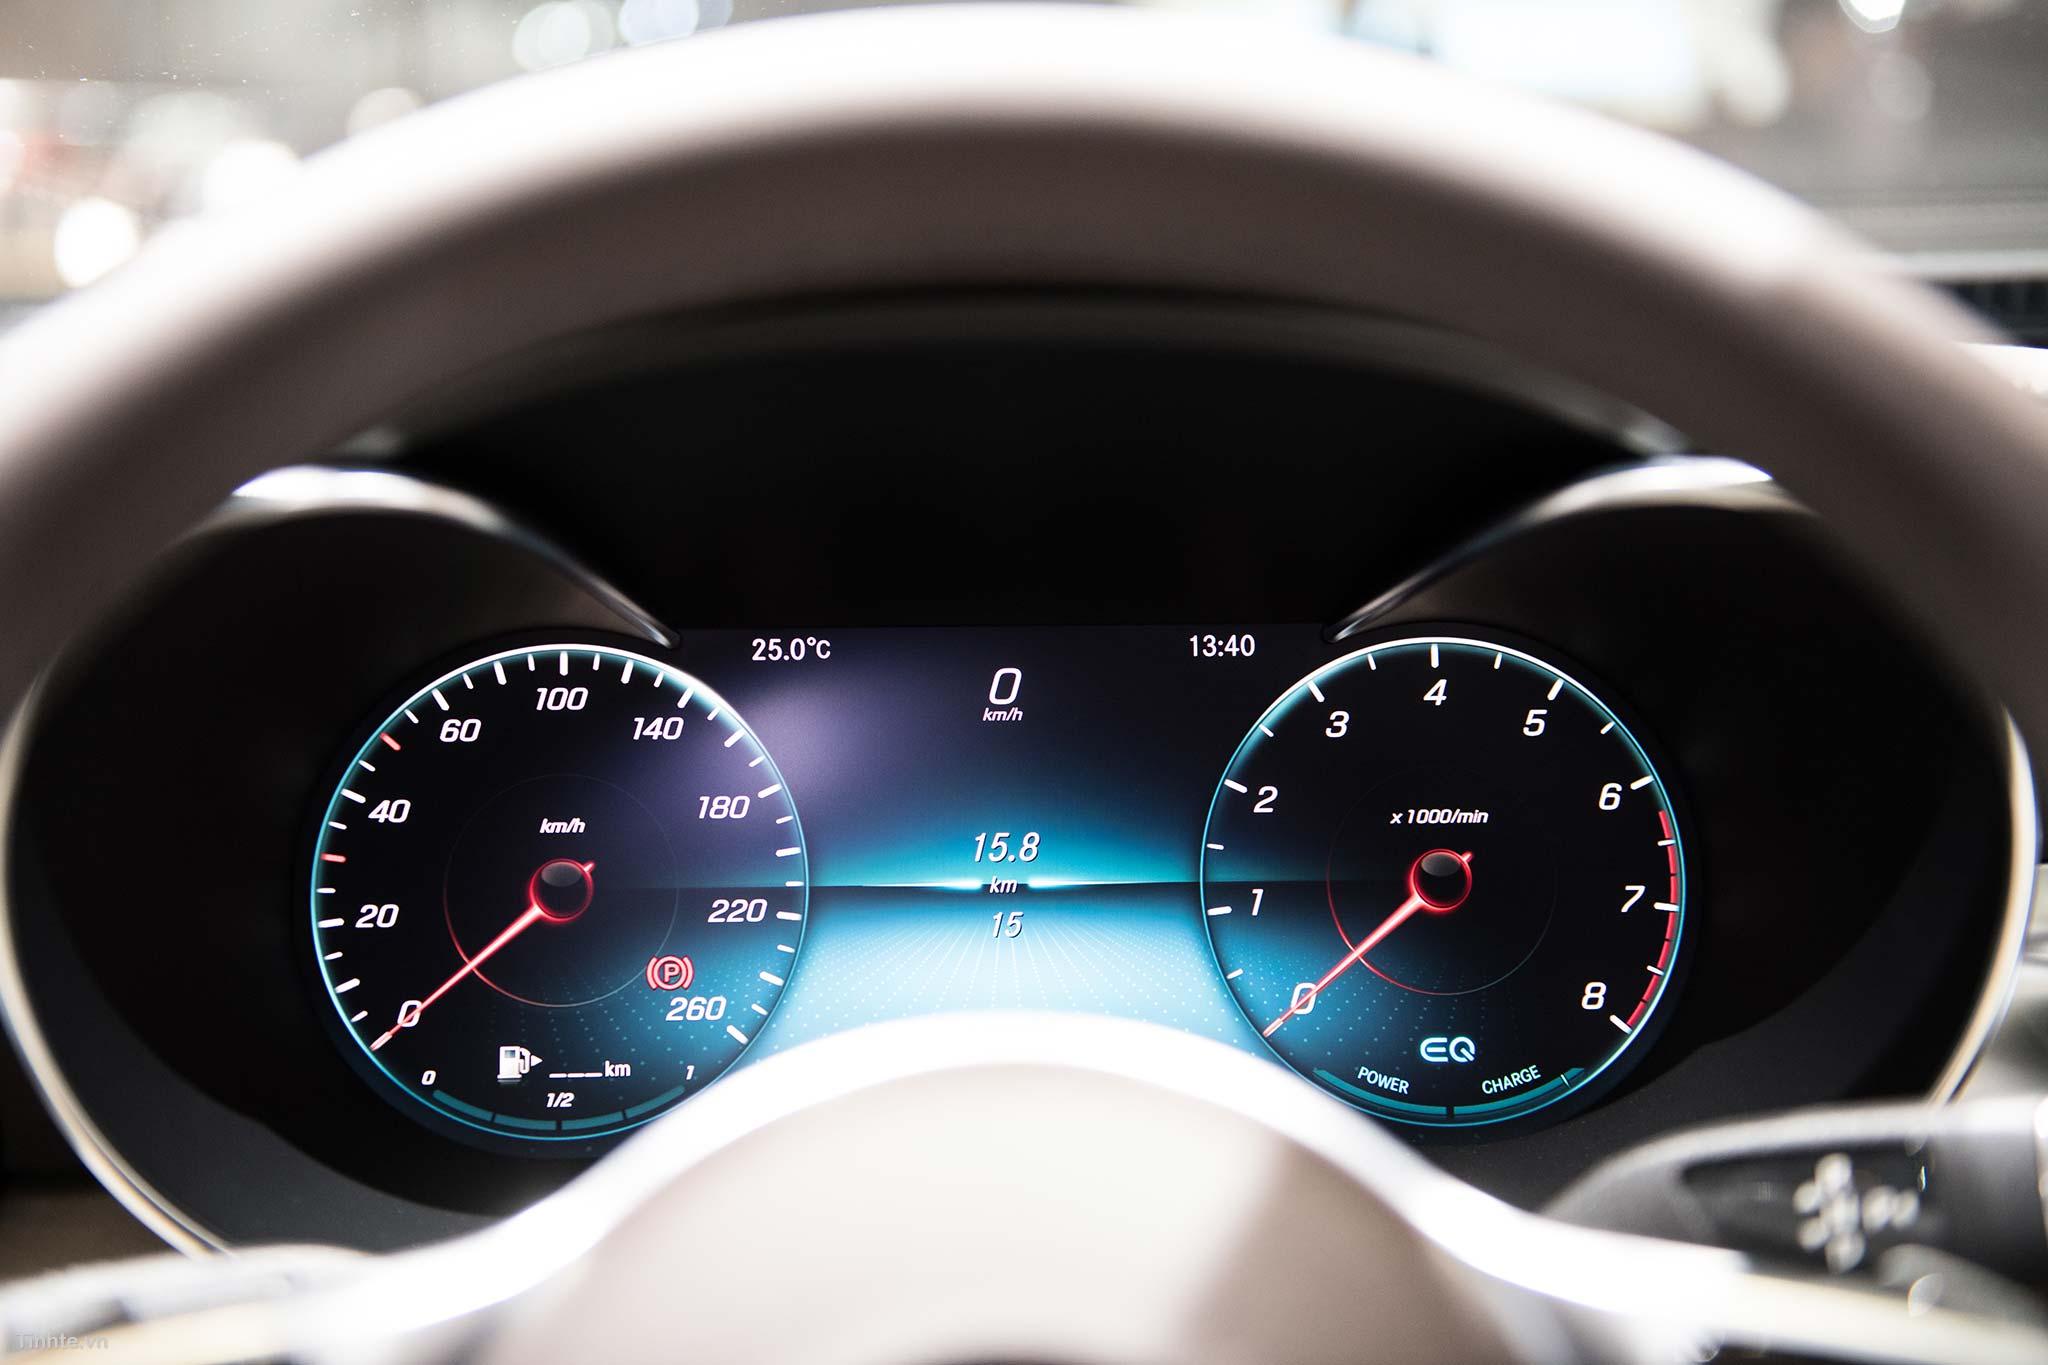 tinhte_Mercedes-Benz-C-200-4MATIC-28.jpg